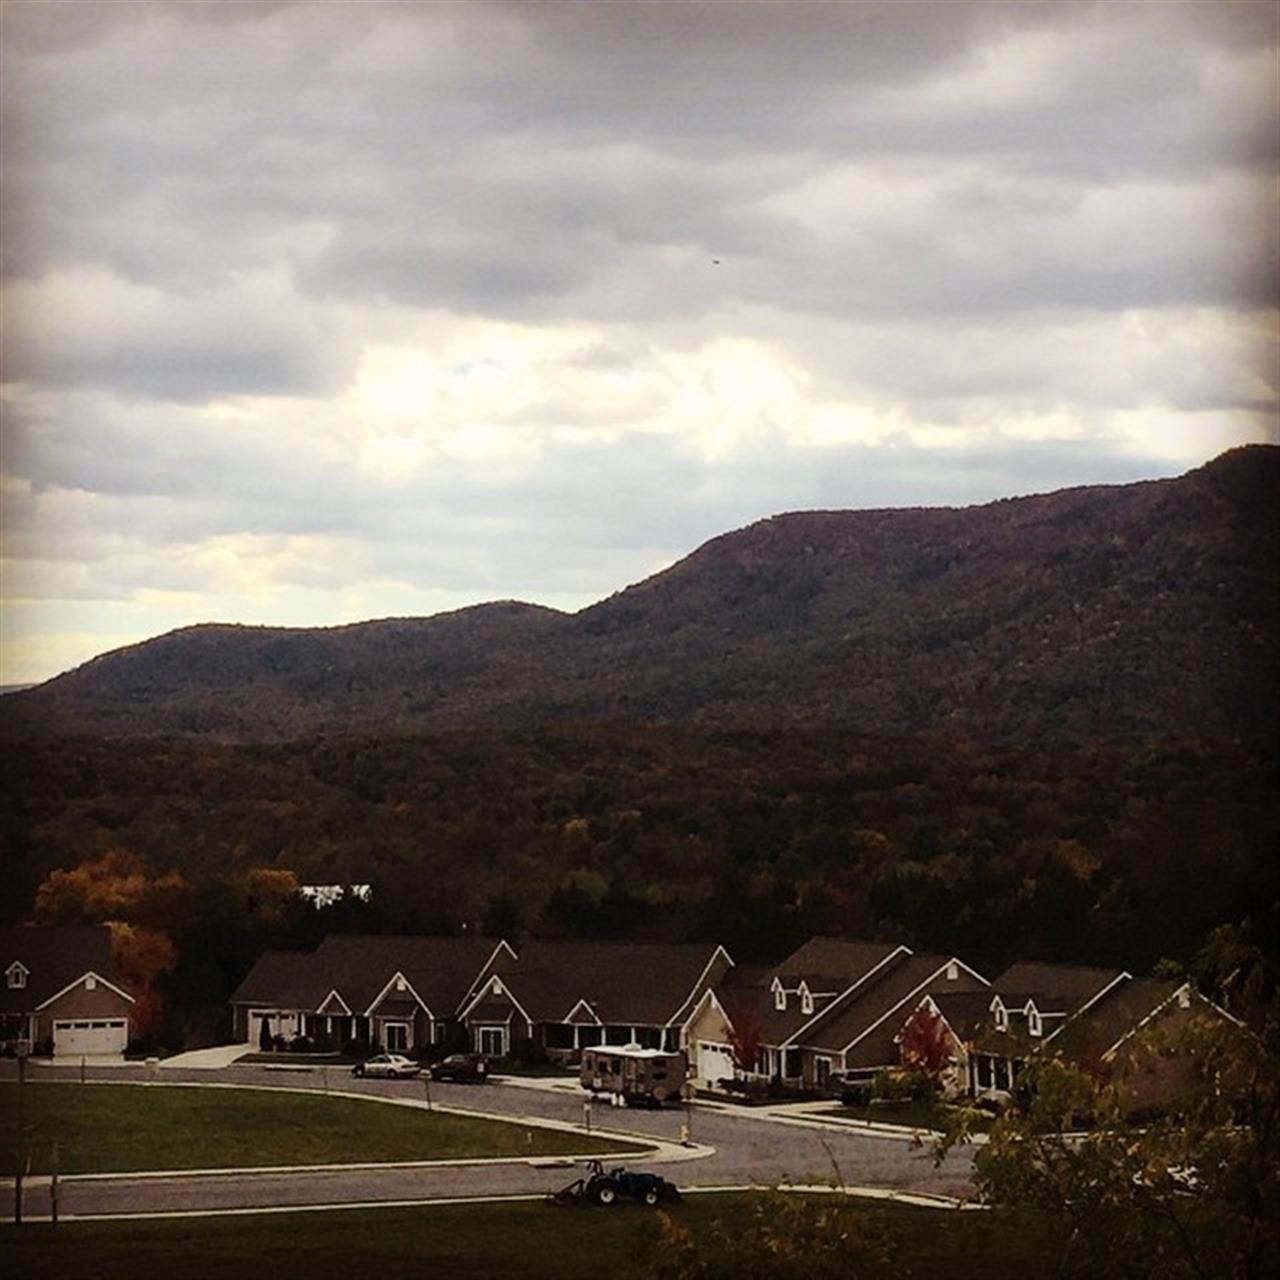 In the valley Shenandoah, VA